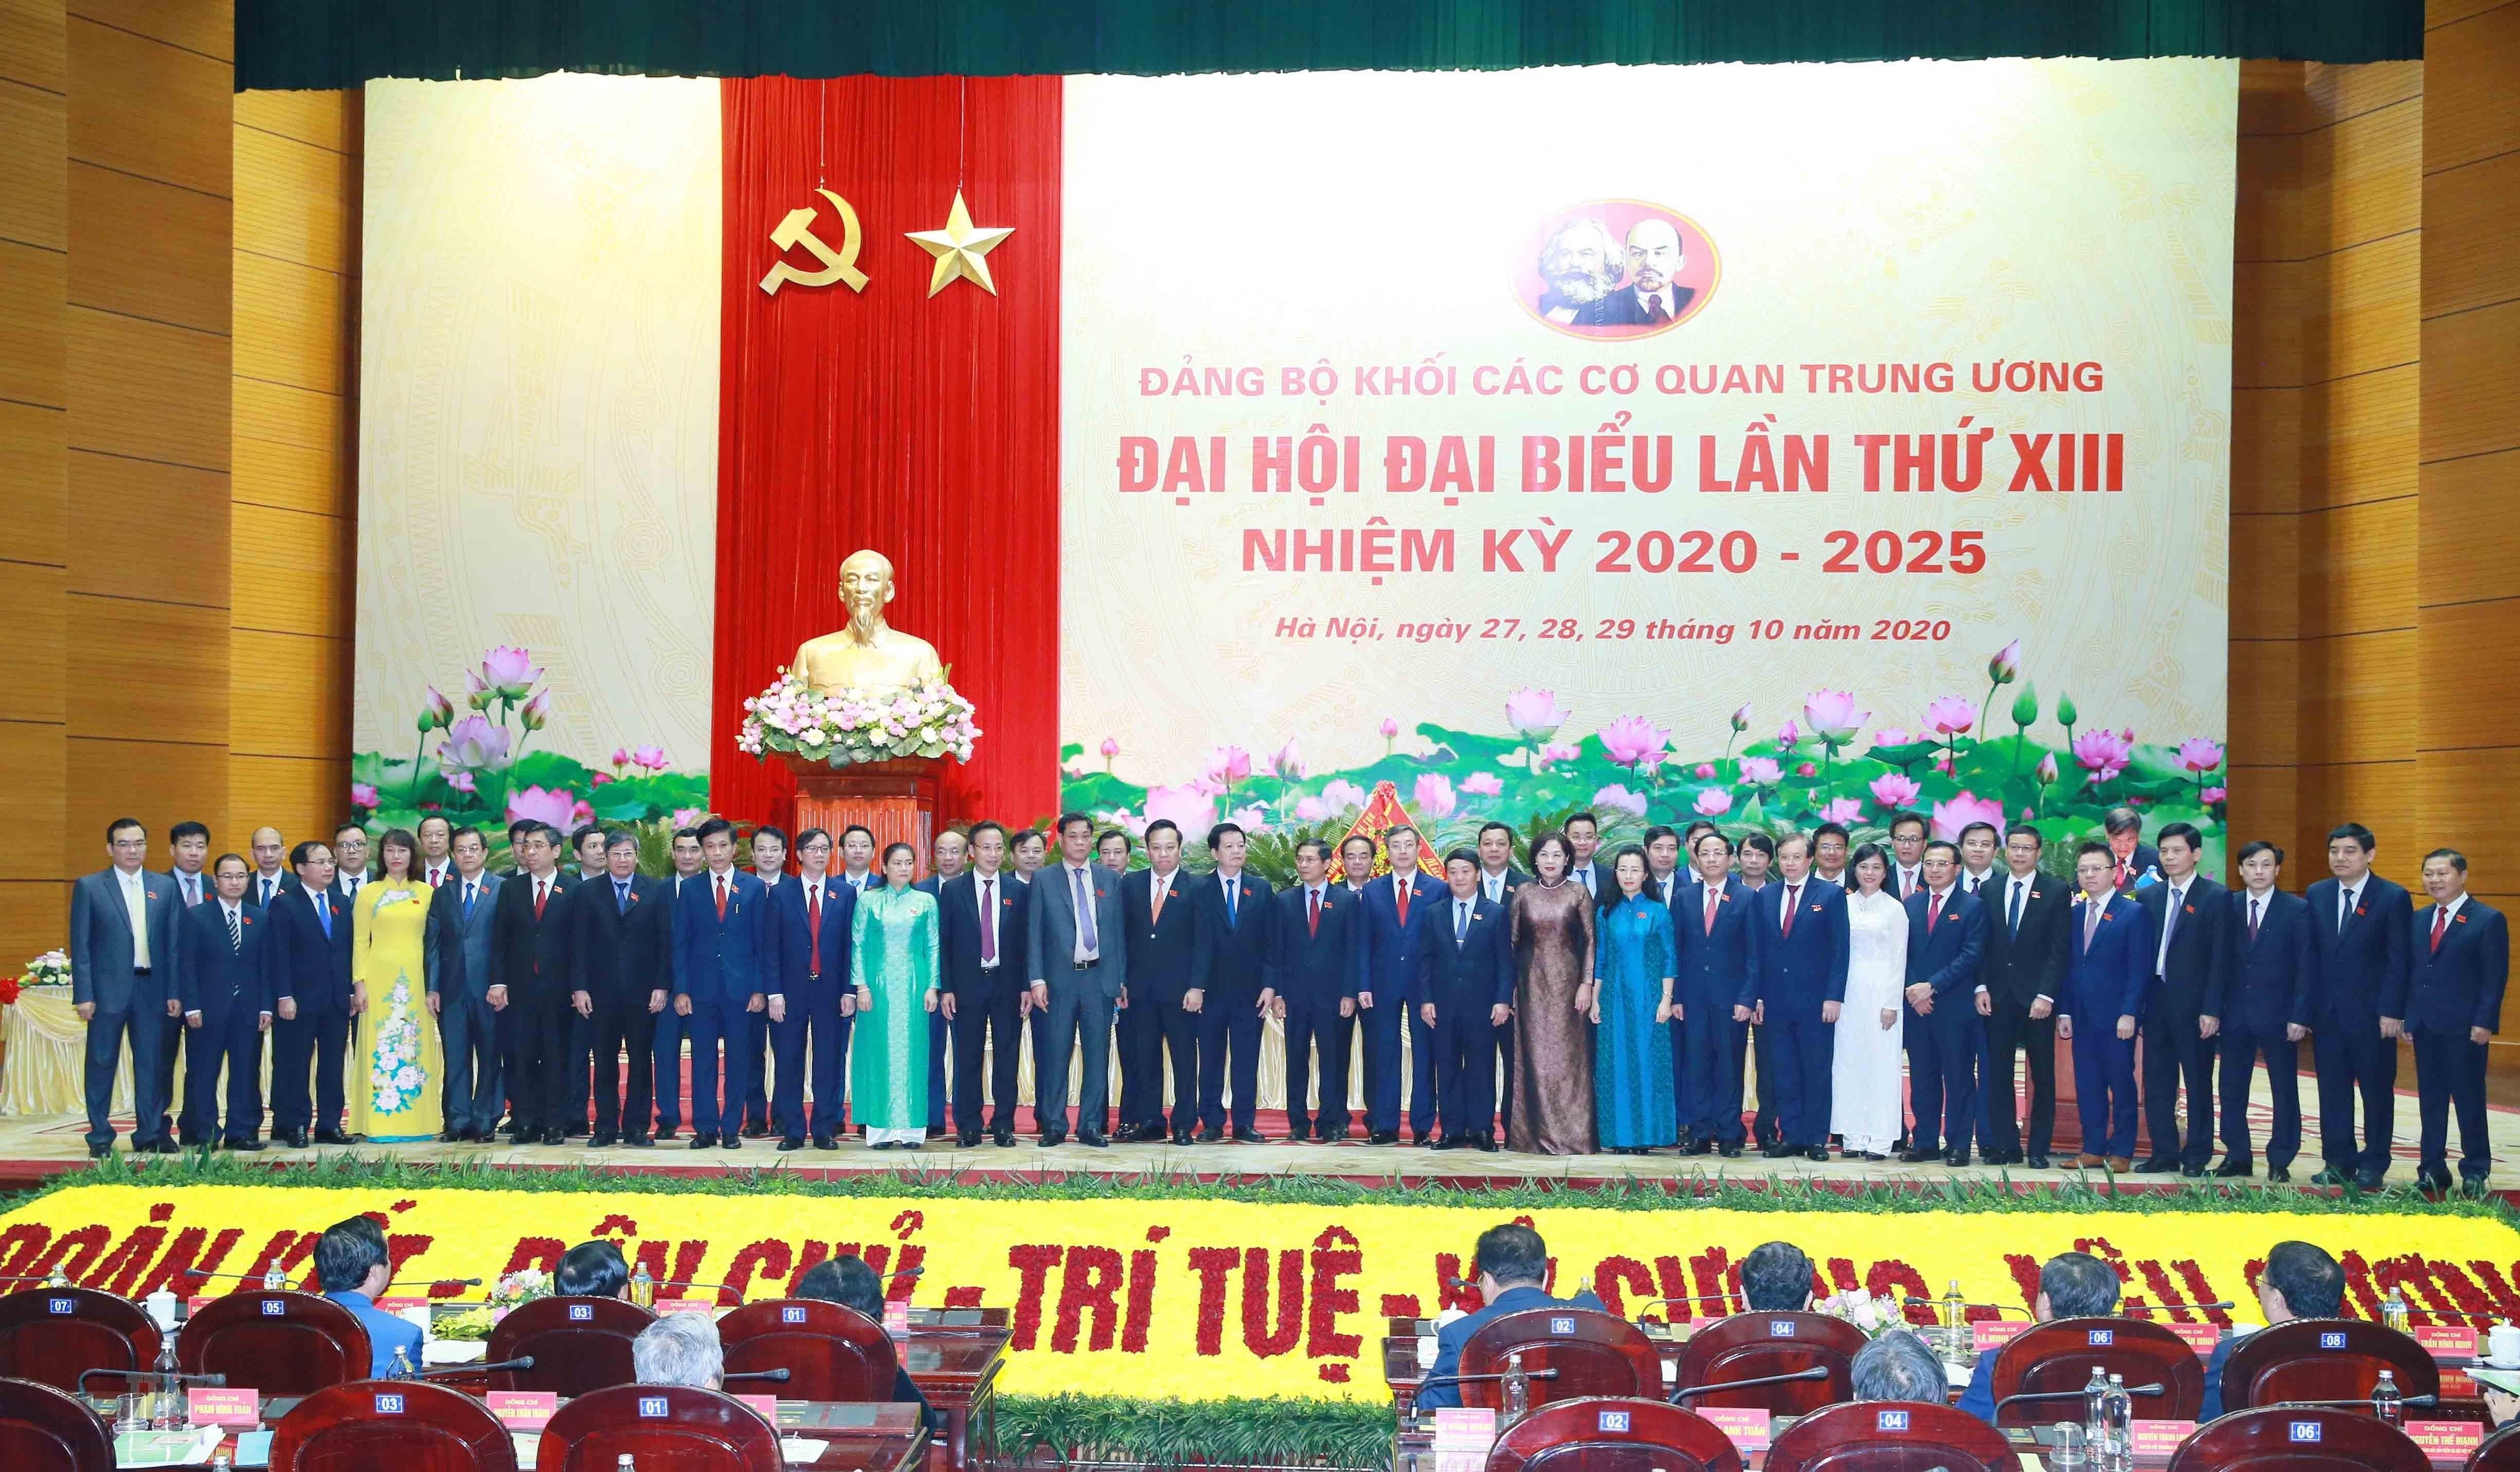 Ong Huynh Tan Viet giu chuc Bi thu Dang uy Khoi cac co quan Trung Uong hinh anh 3